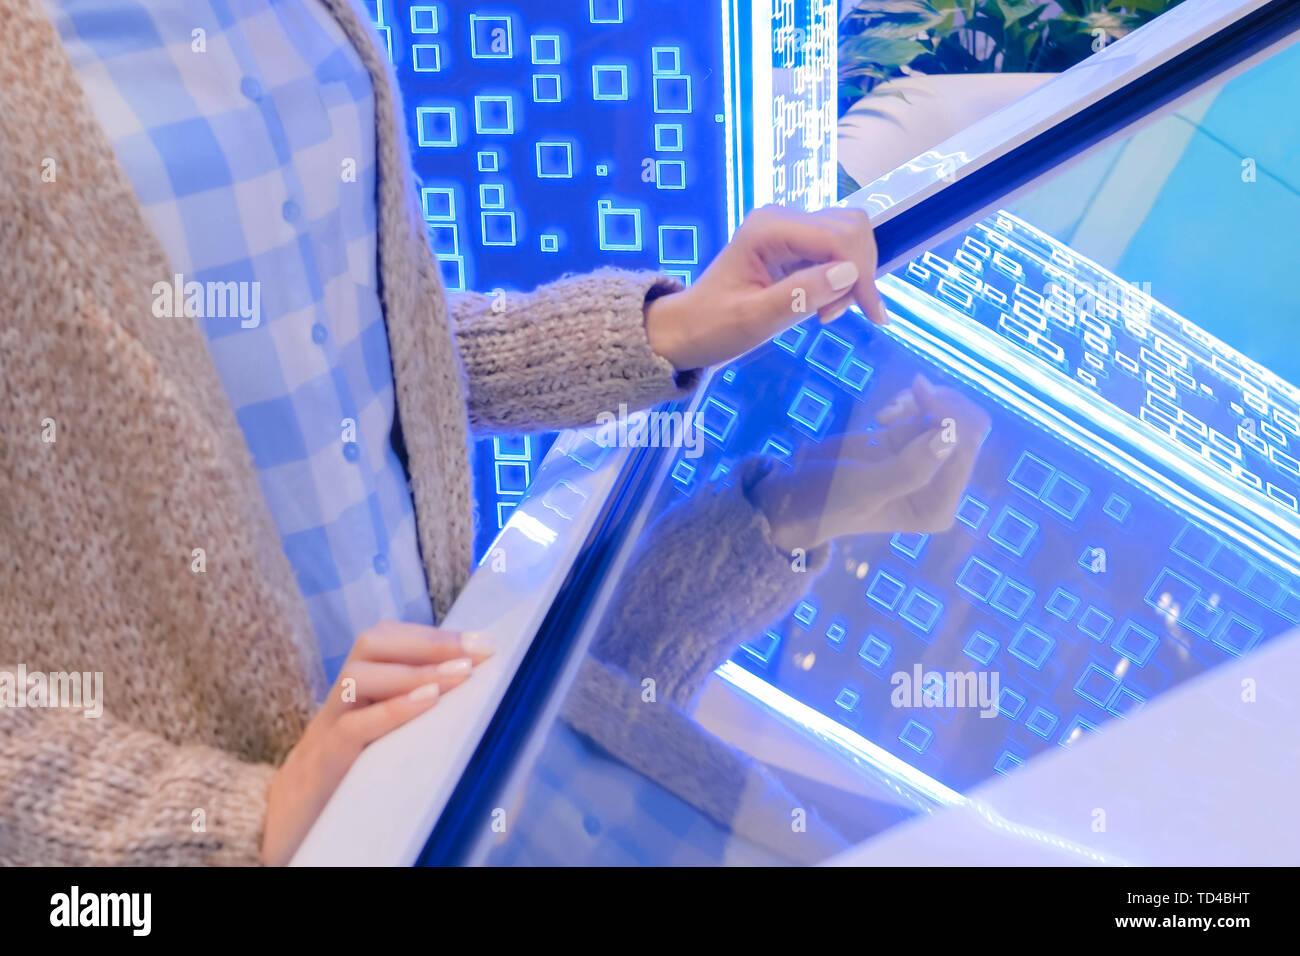 Woman using multimedia touchscreen display of interactive kiosk - Stock Image